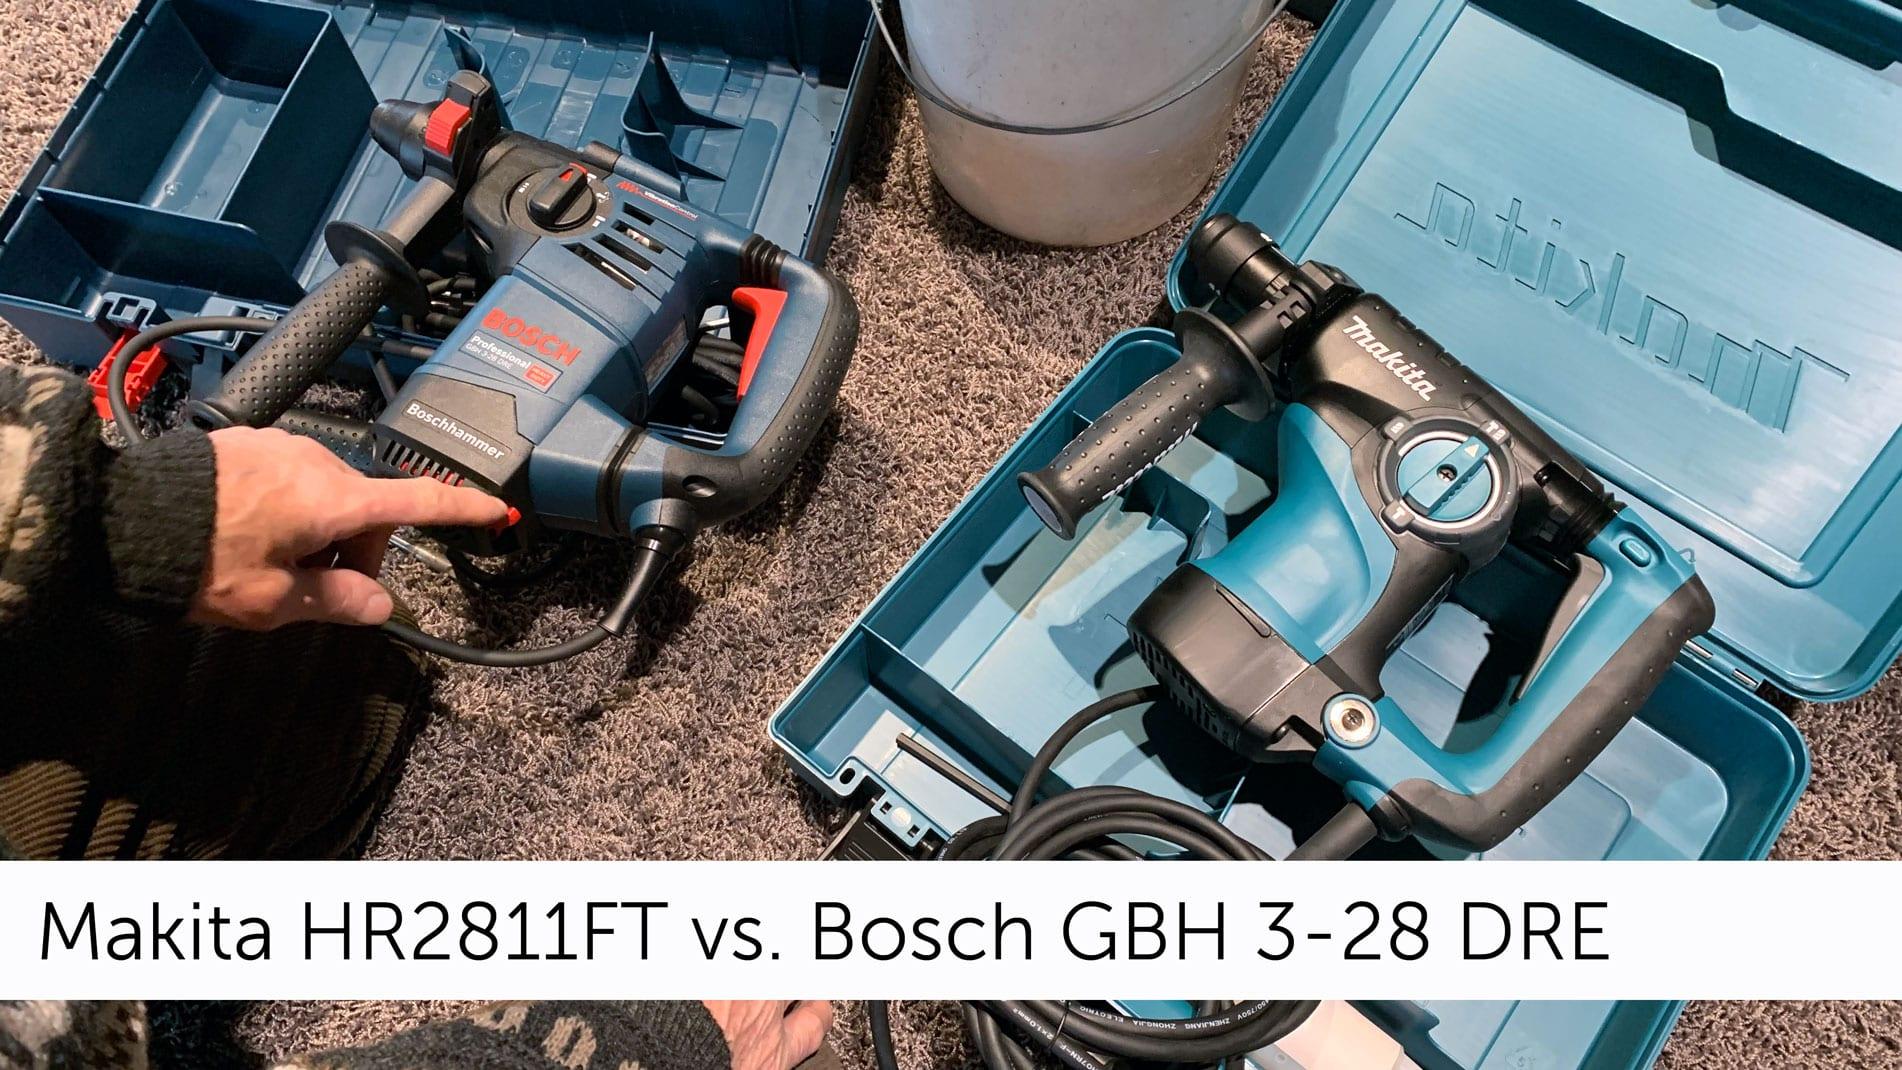 Bohrhammer Test: Makita HR2811FT vs. Bosch GBH 3-28 DRE Professional